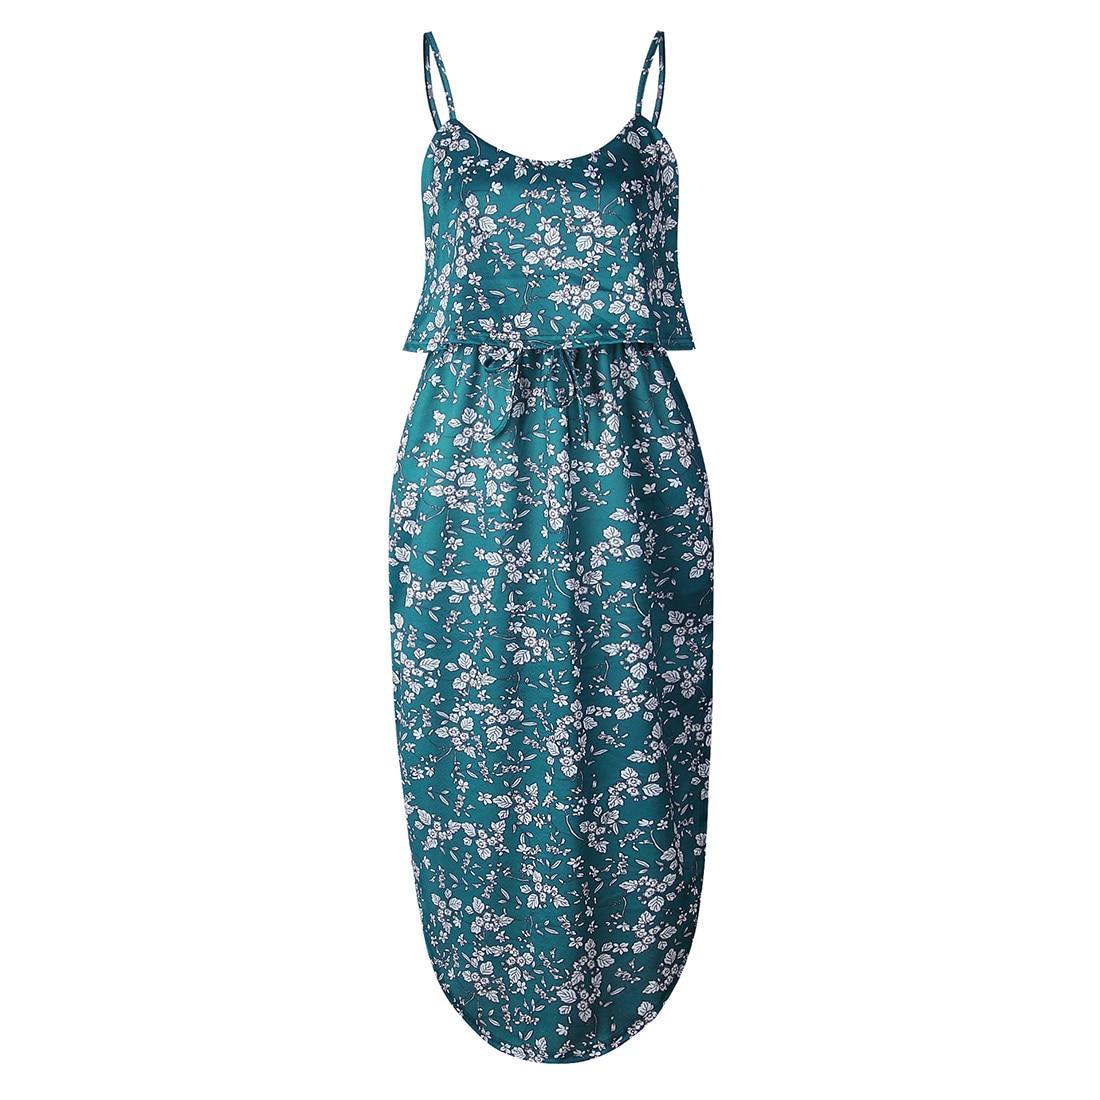 Women Dresses, Summer Sexy Printing Buttons Off Shoulder Sleeveless Dress Princess Dress,for Ladies(L,green)